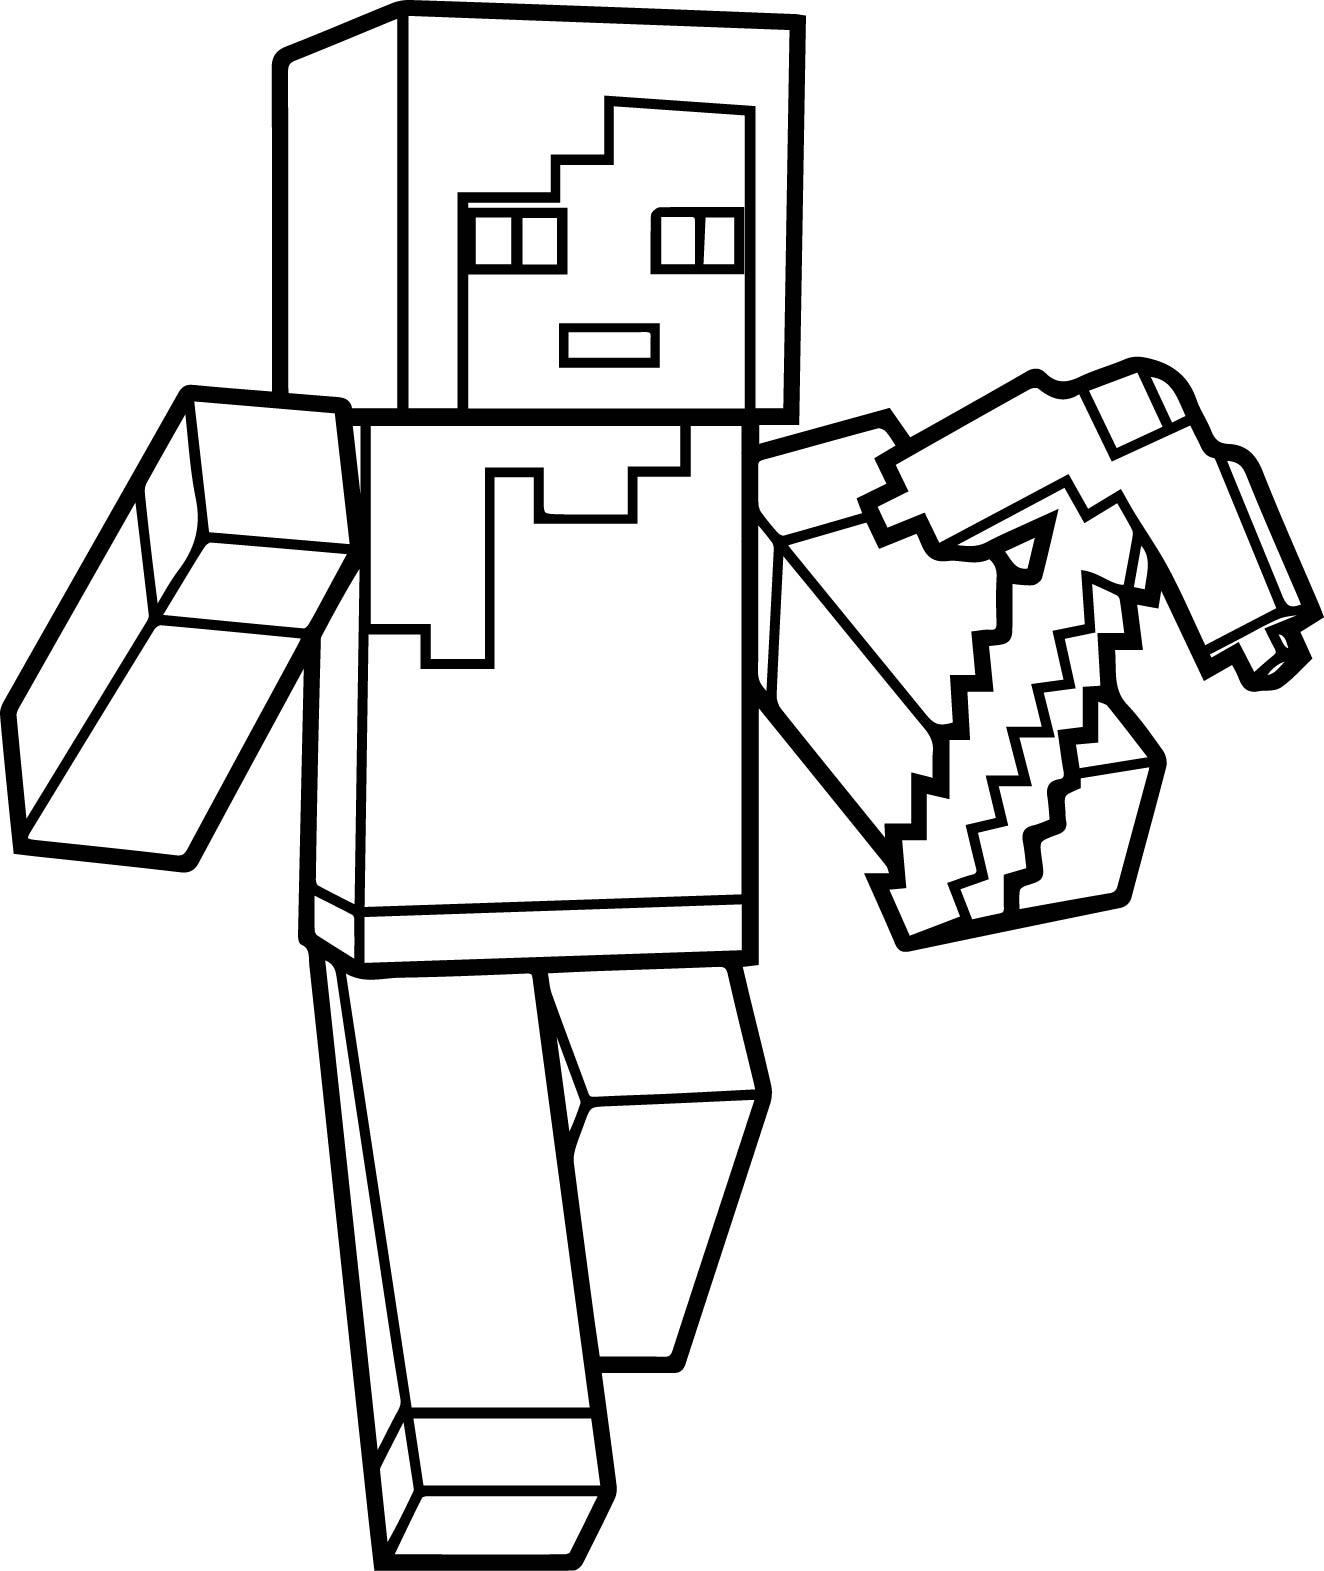 1324x1571 Black And White Minecraft Creeper Clipart